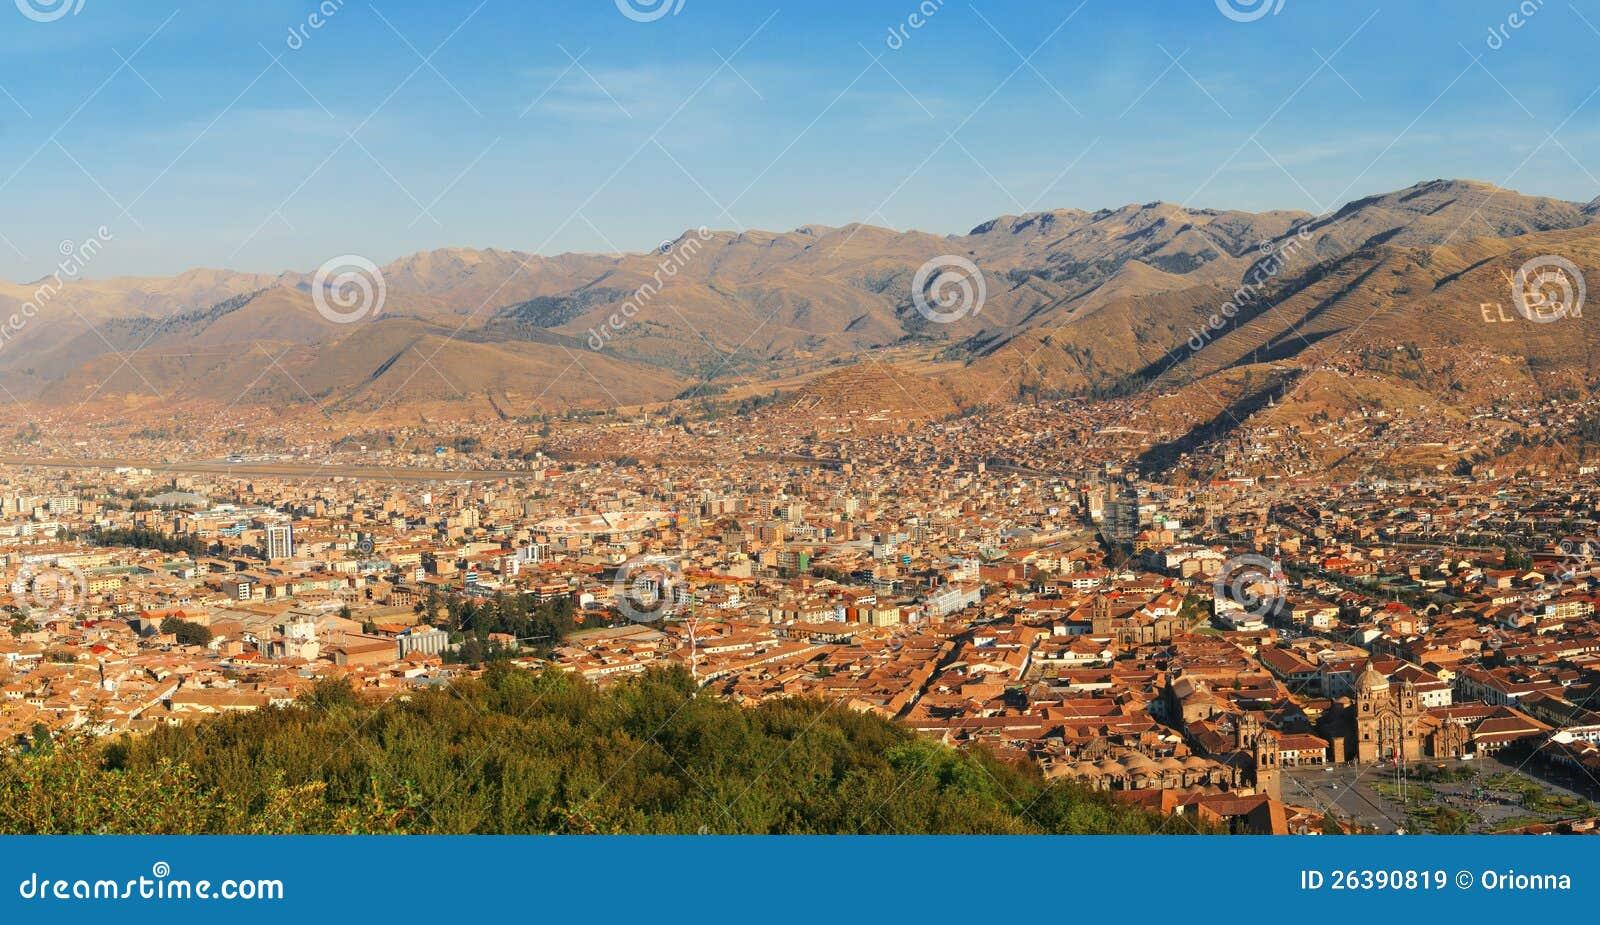 EL Peru de Viva, Cuzco, vista panorâmico